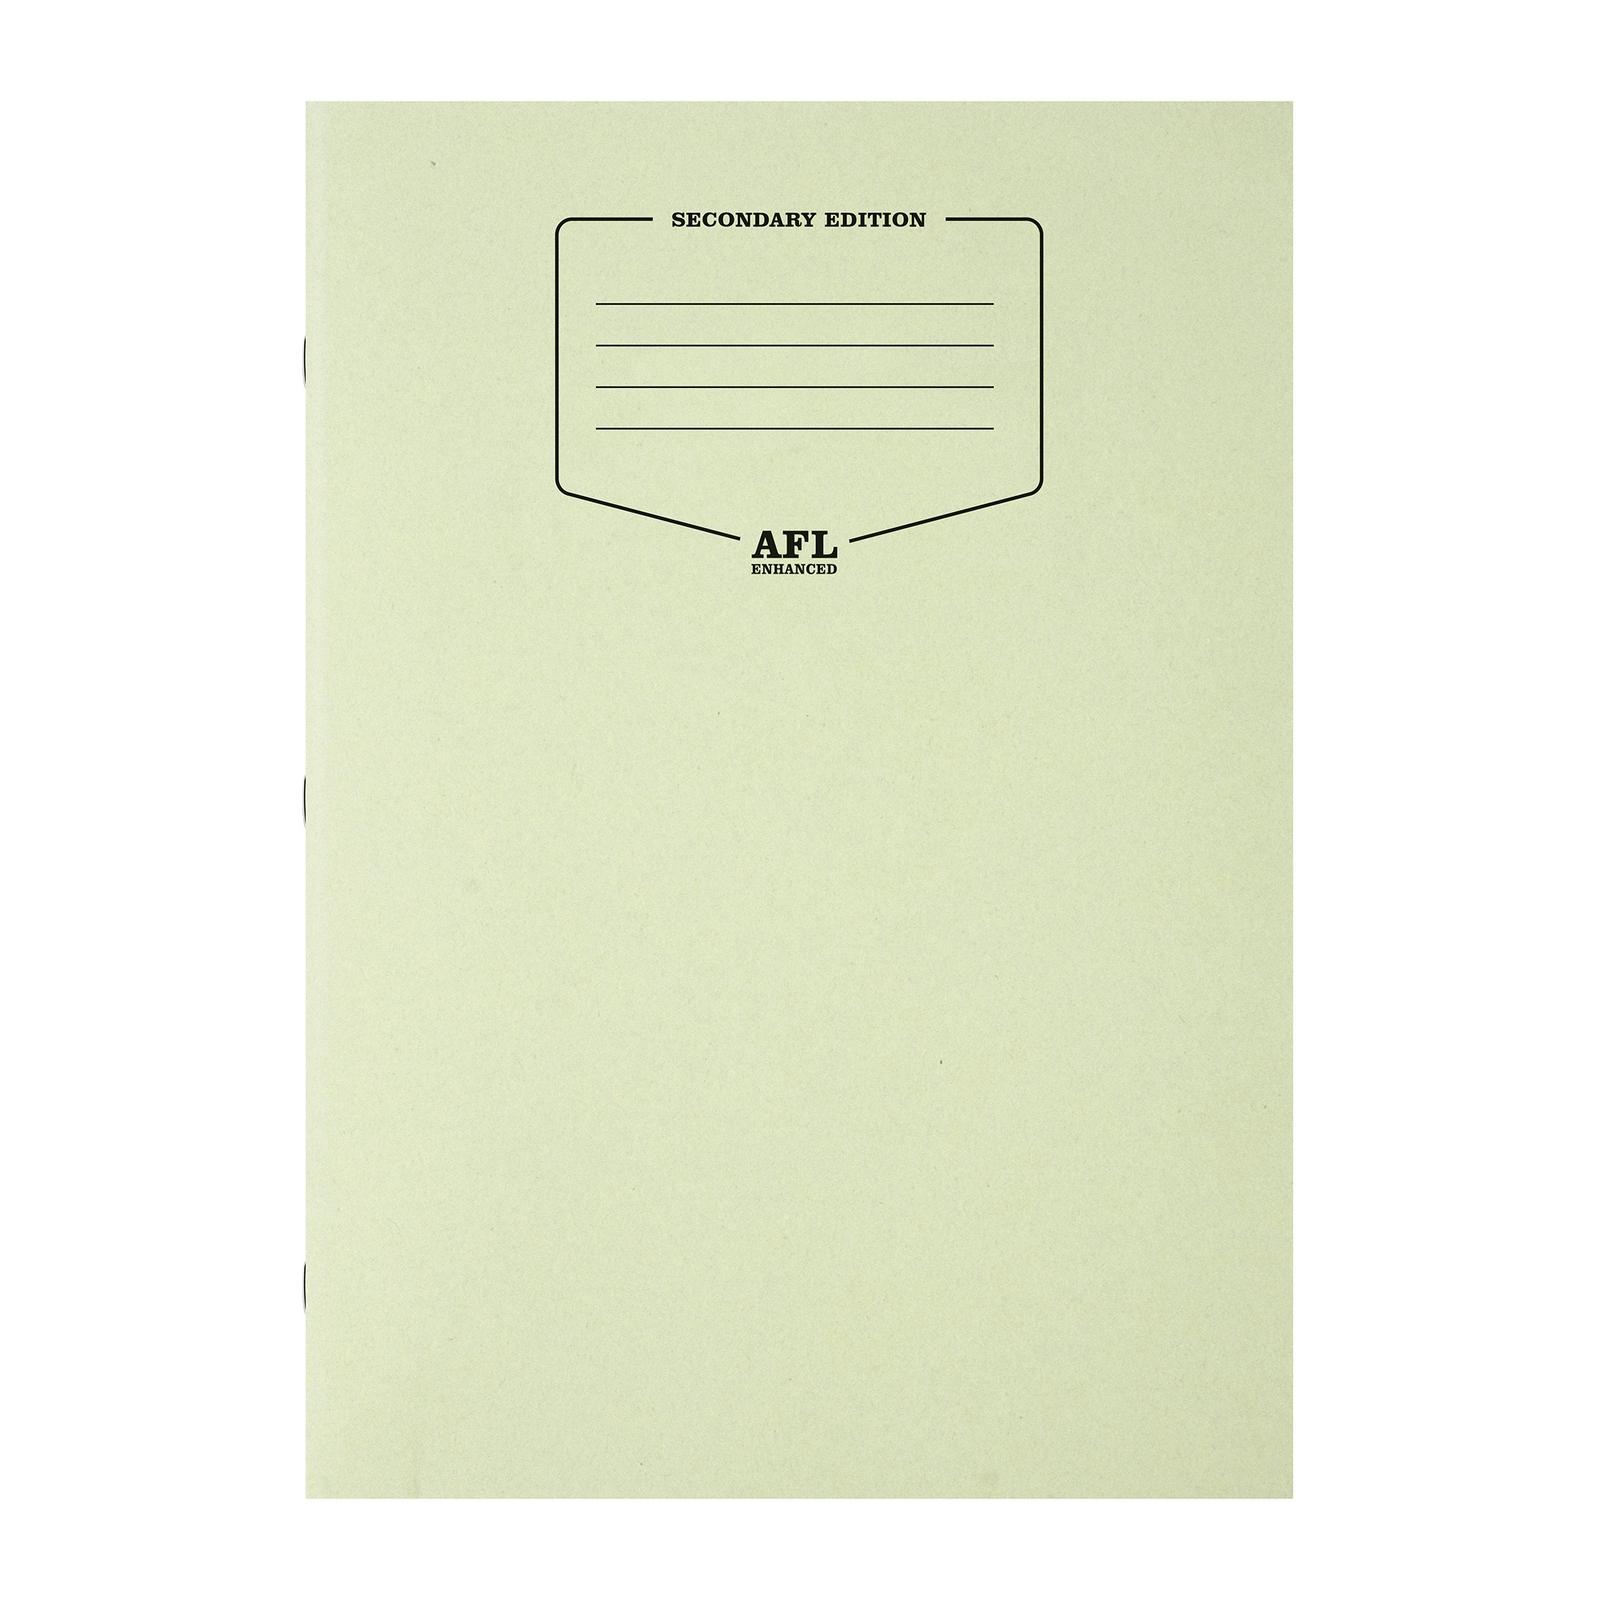 A4 AFL Enhanced Exercise Books  - Green